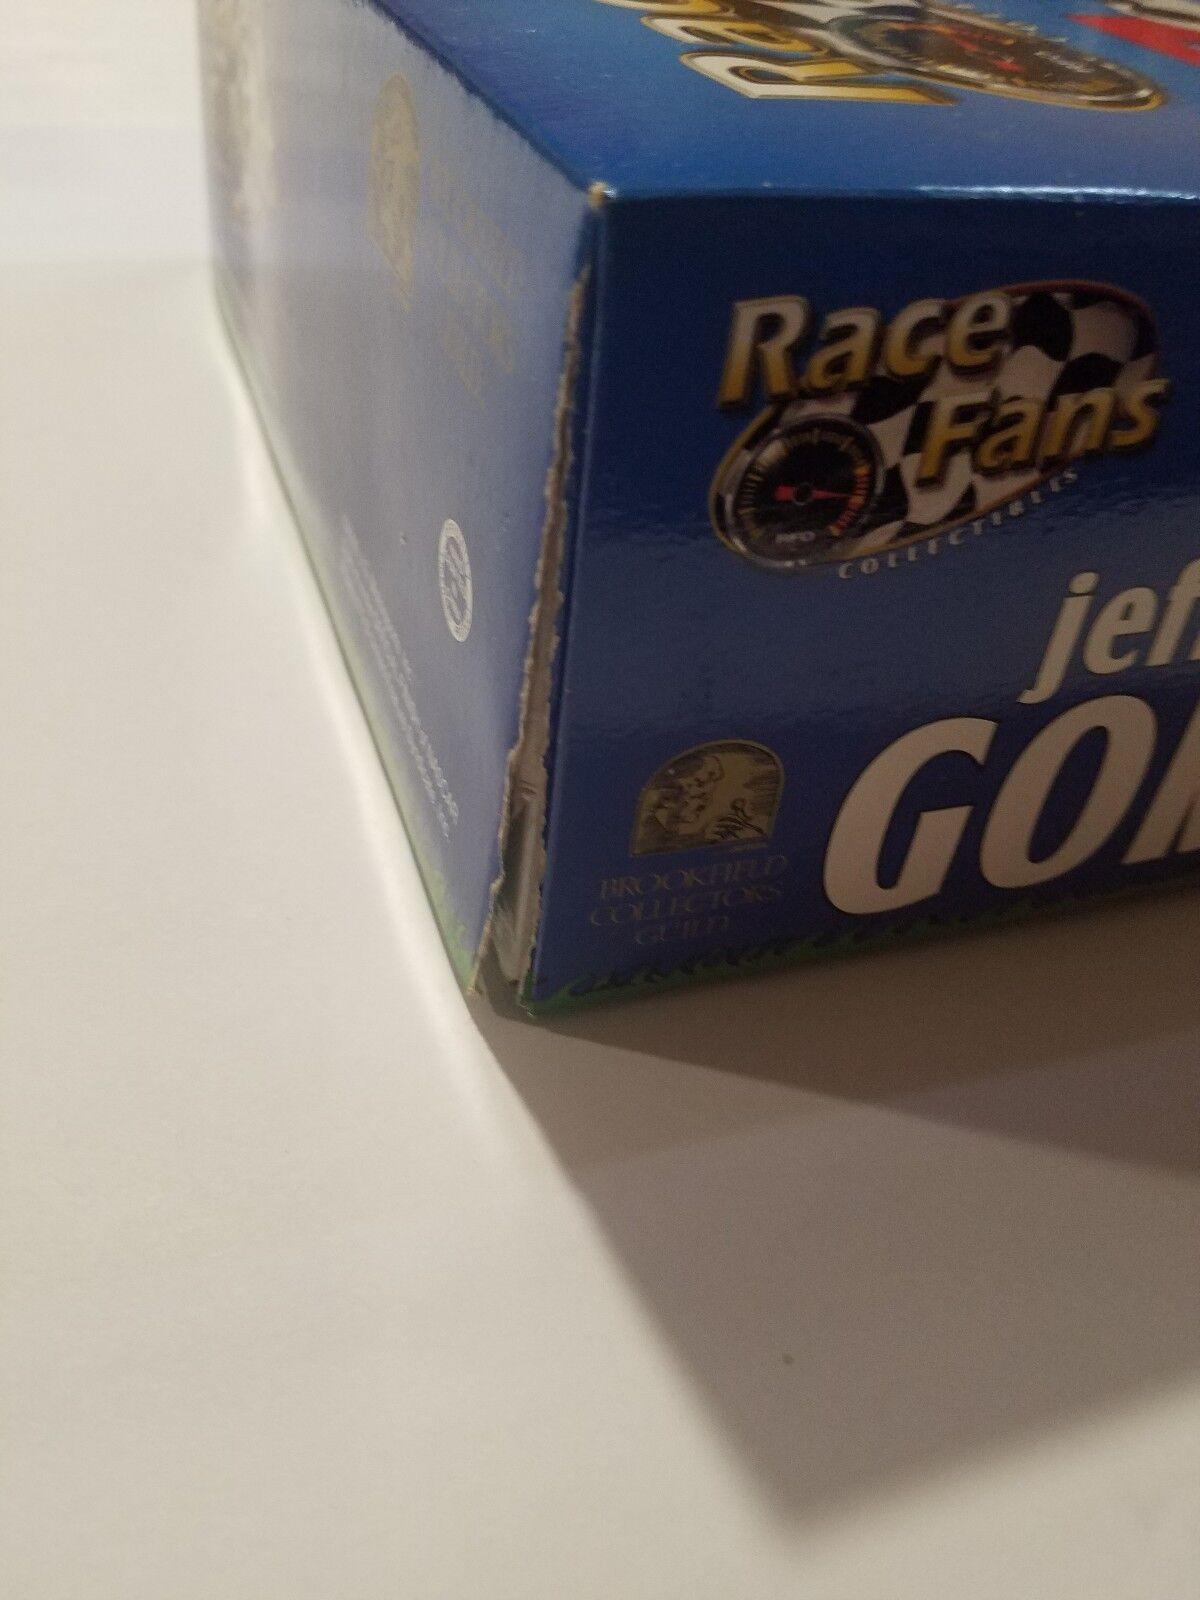 Jeff Jeff Jeff Gordon Number 24 Dupont Peanuts 2000 Monte Carlo 1 Of 20,000 2 - 1 24 945ee2